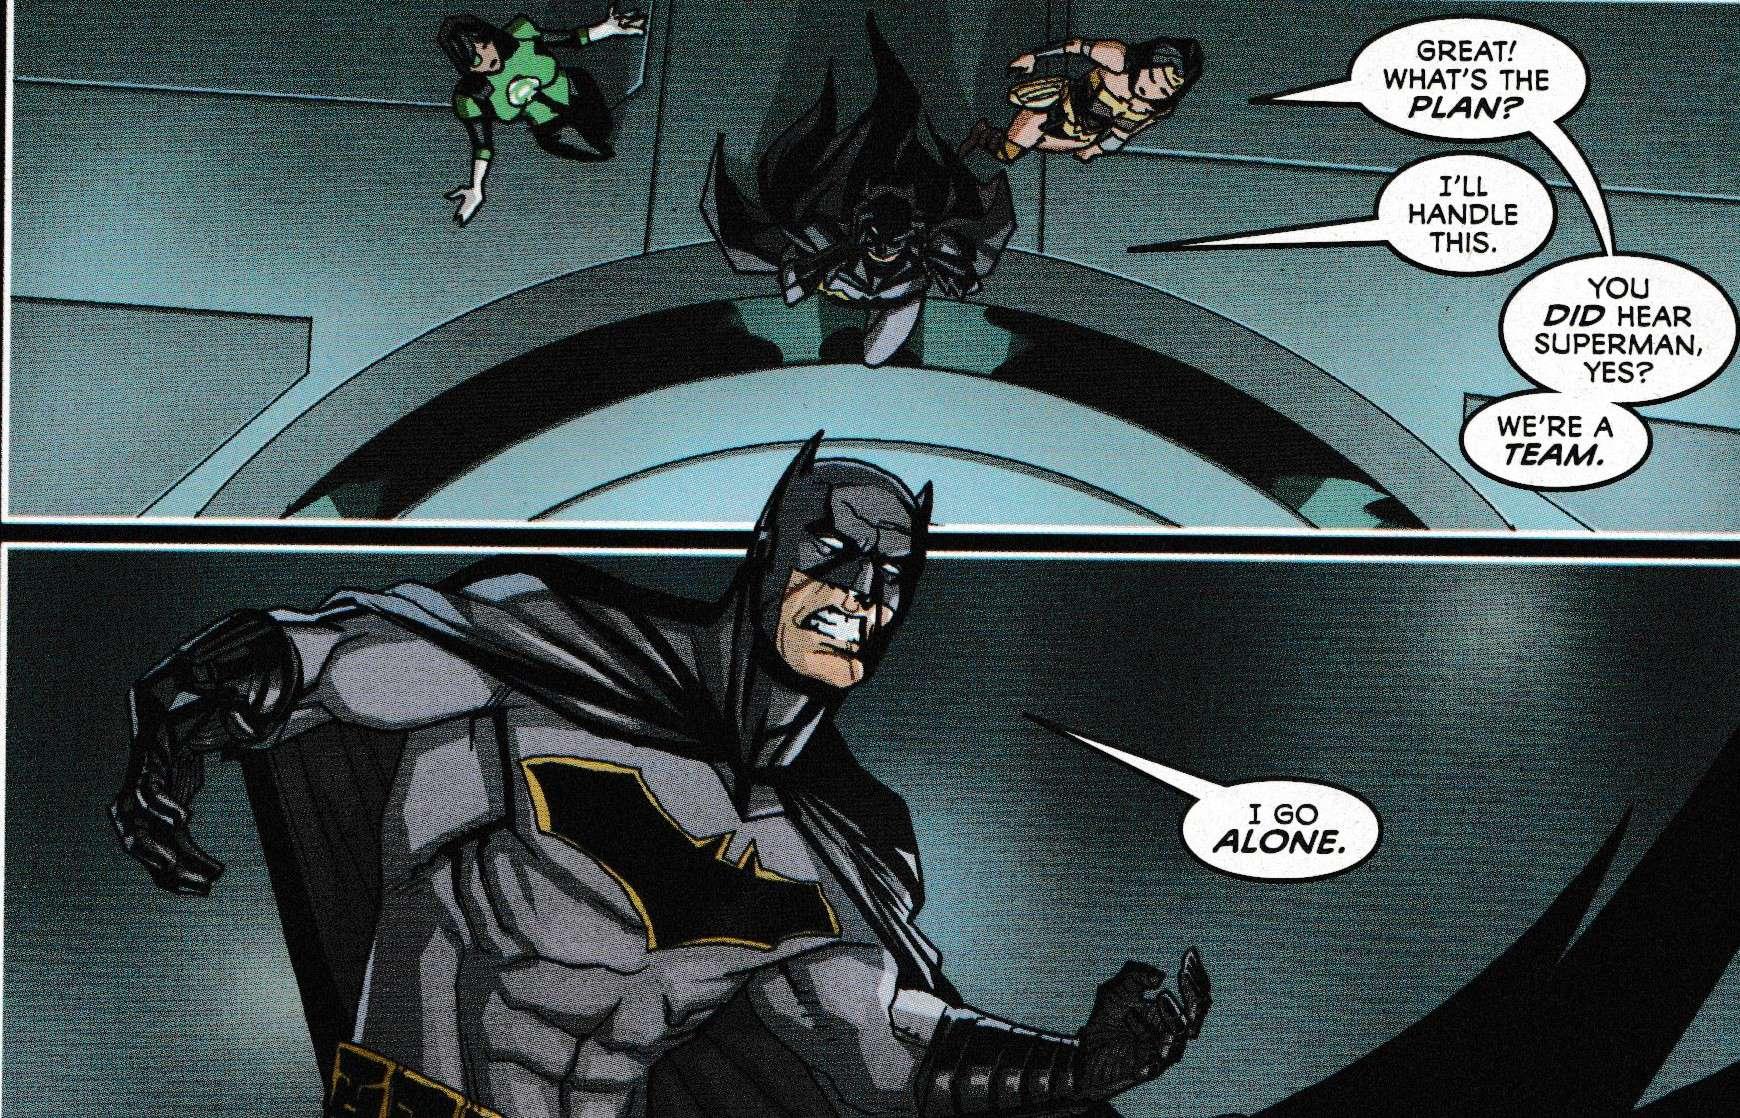 Batman alone